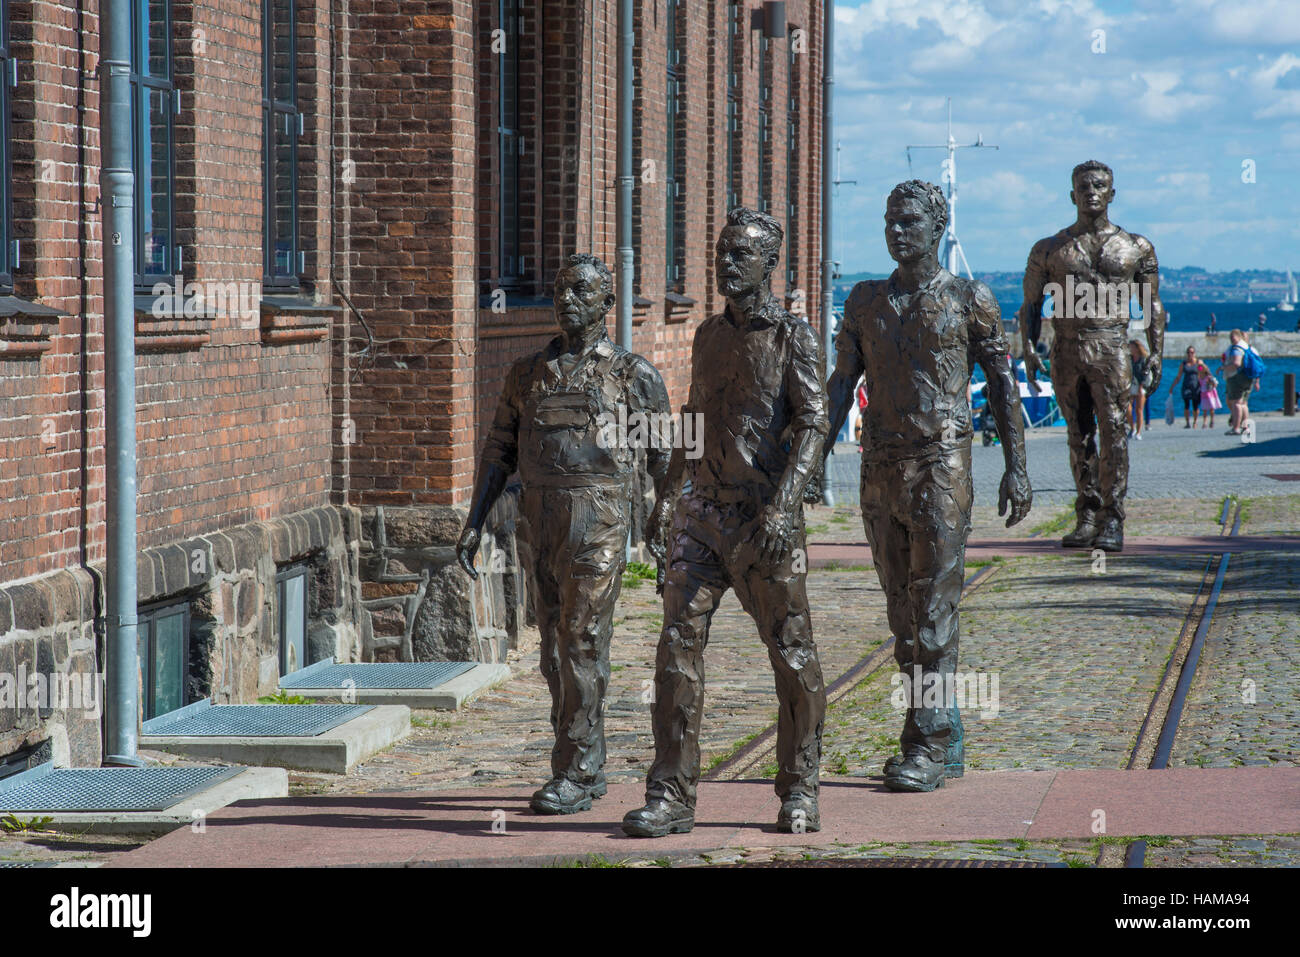 Sculptures of shipyard workers by artist Hans Pauli Olsen, at the dockyard museum in Elsinore, Hovedstaden Region, - Stock Image